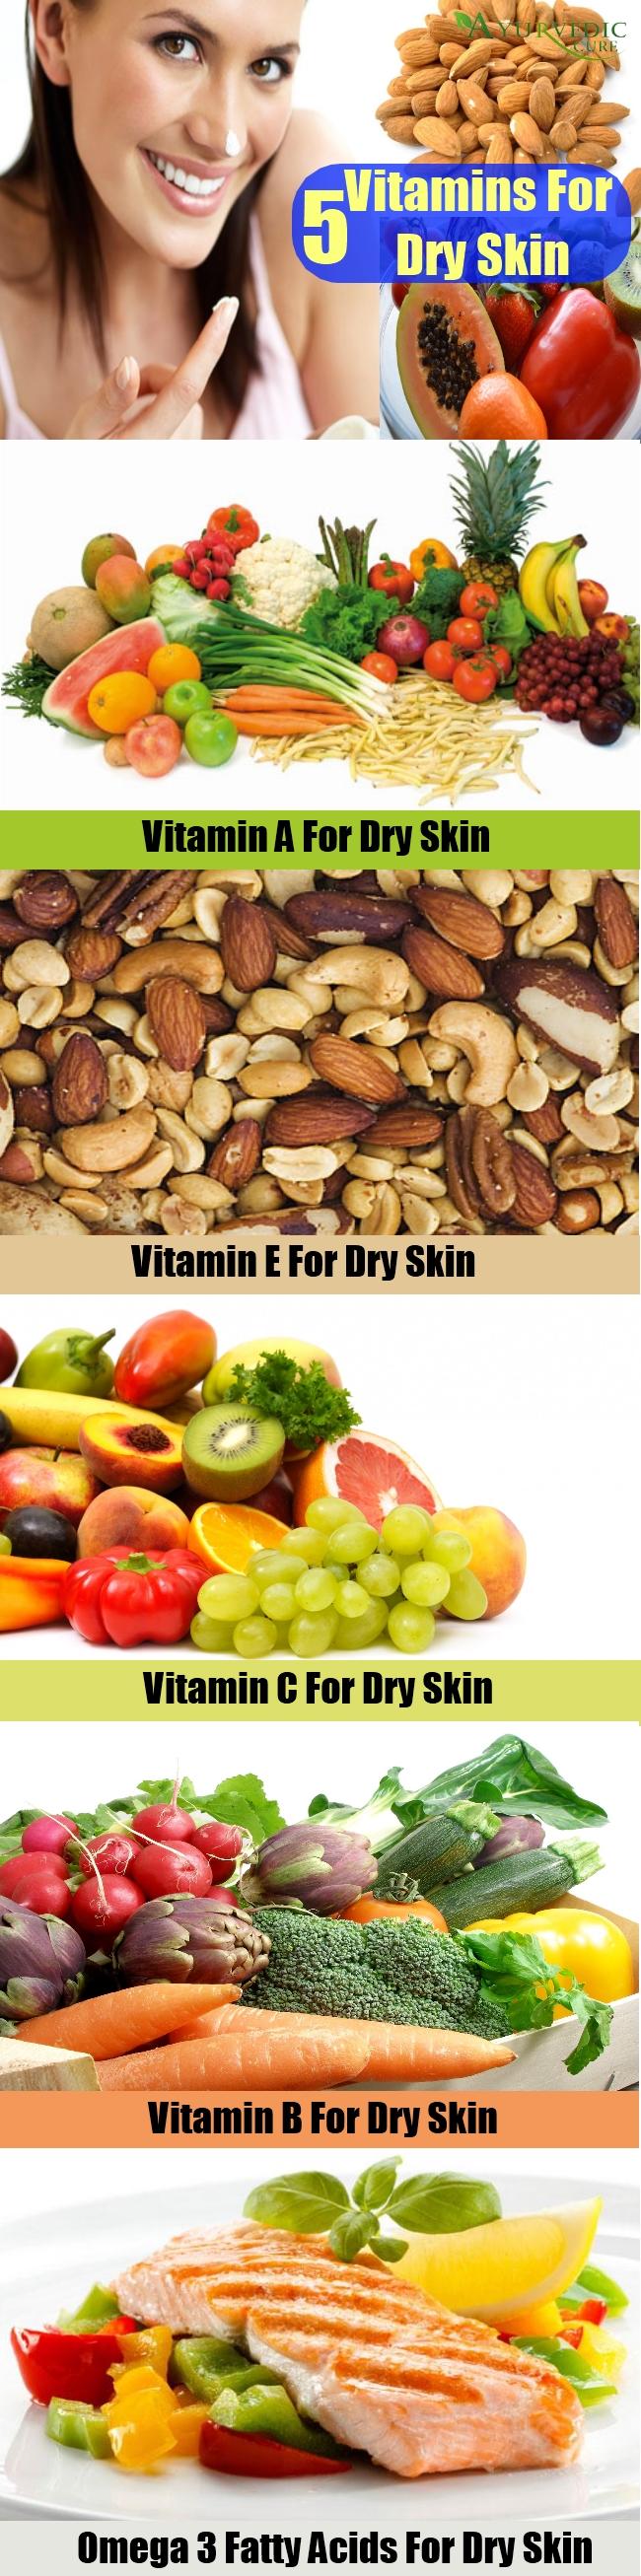 5 Vitamins For Dry Skin